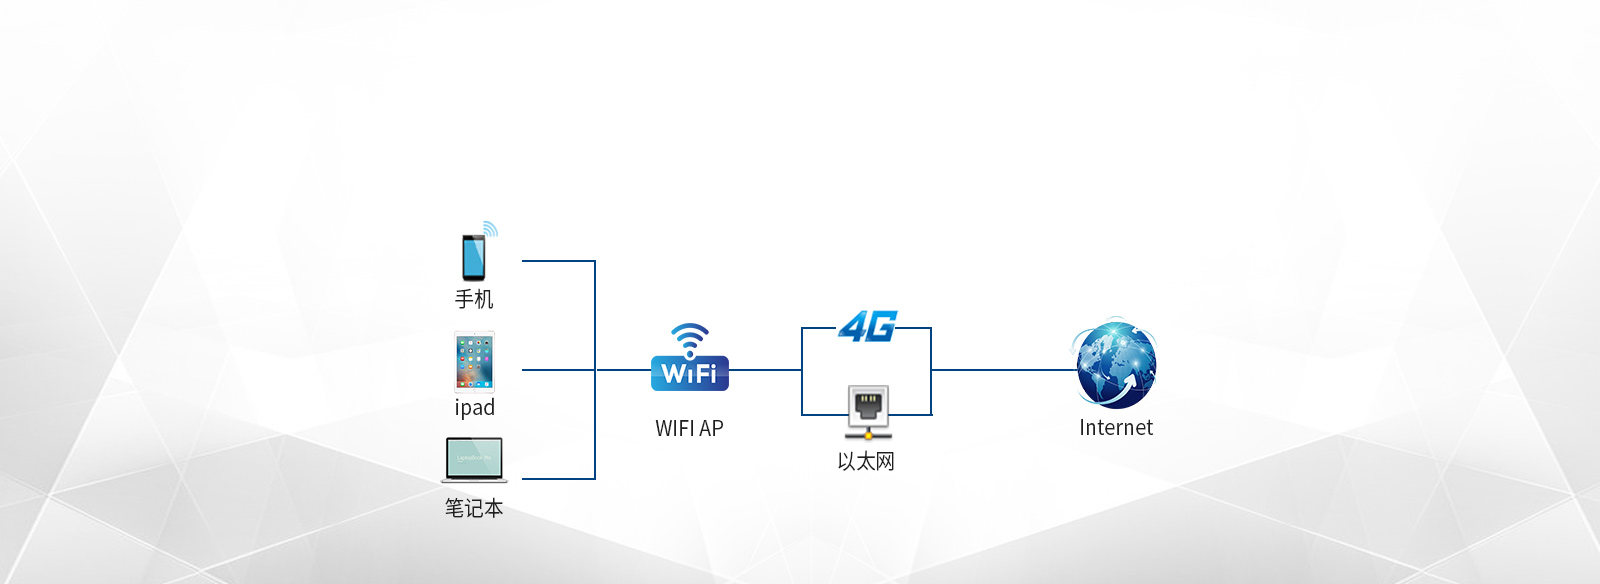 gong襠i?刂С諻iFi、4G、yi太网